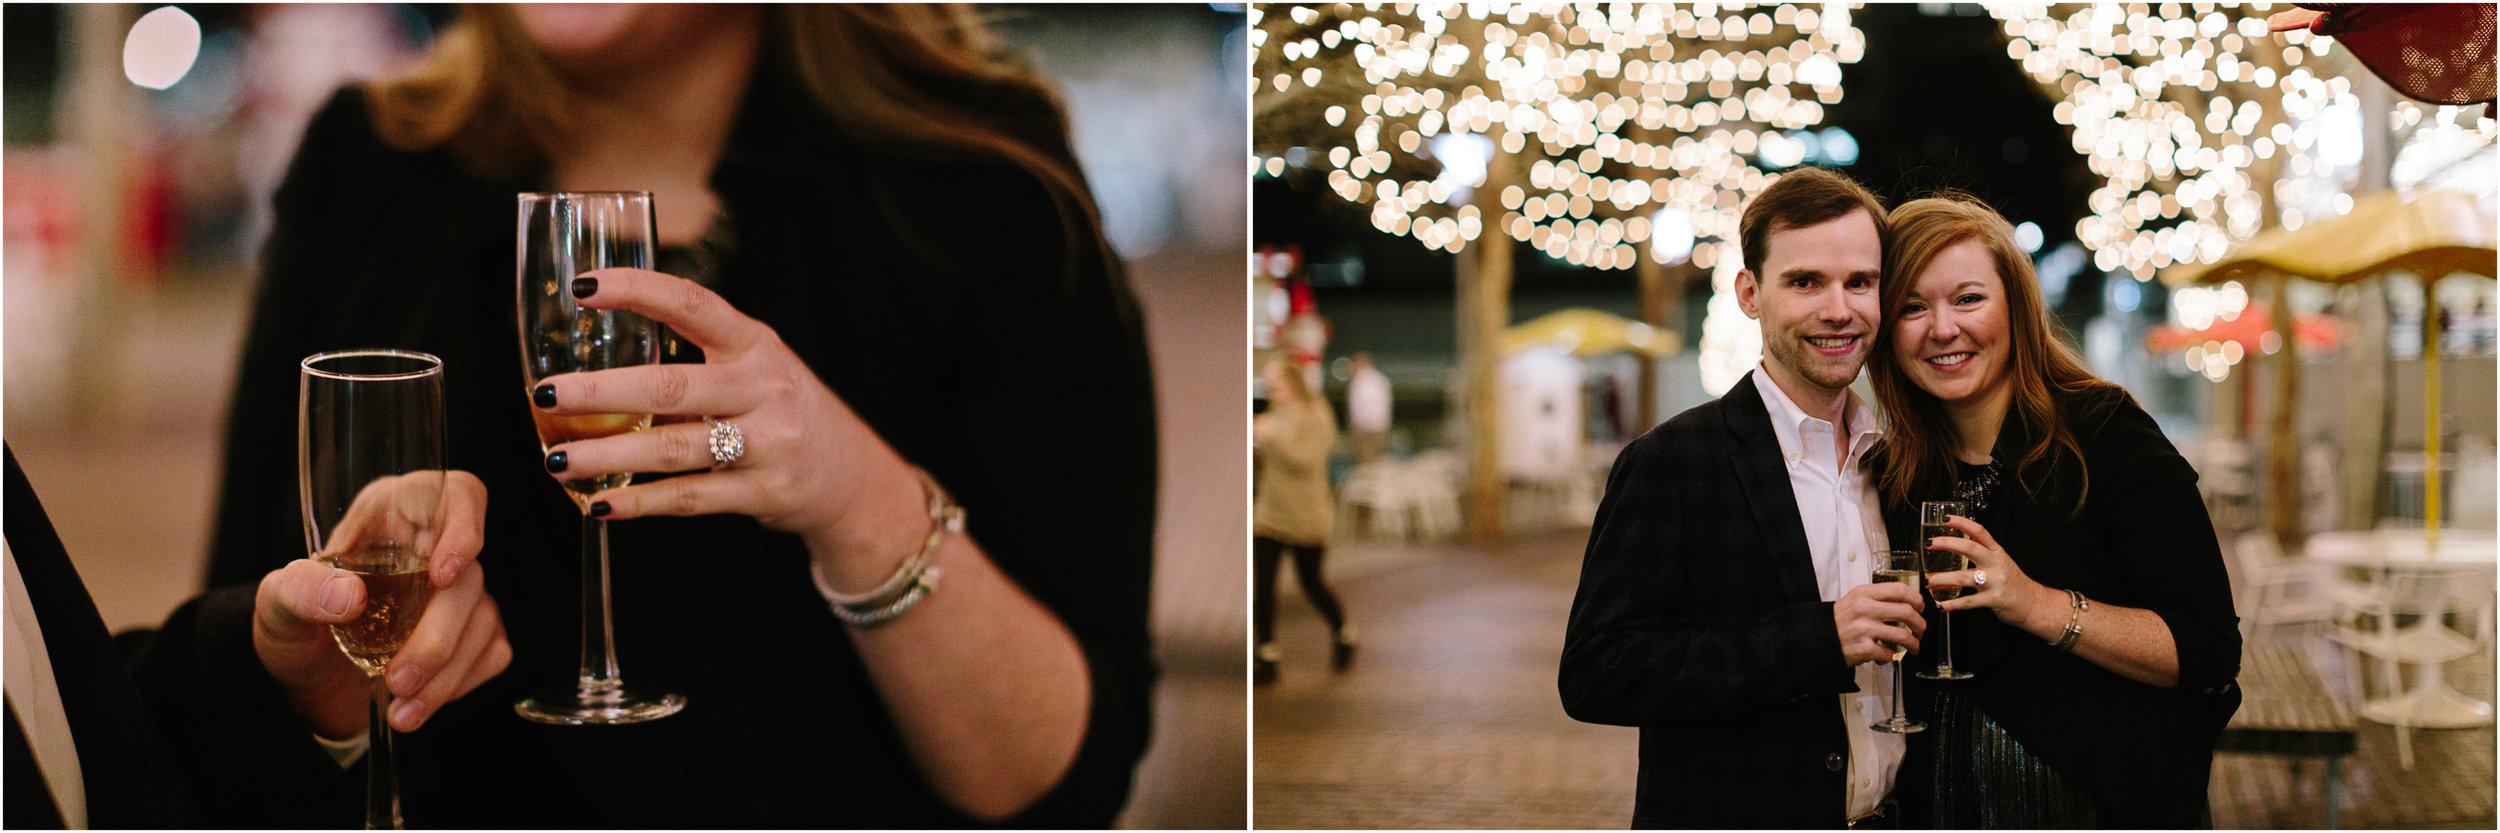 alyssa barletter photography crown center kansas city wedding proposal how he asked-7.jpg